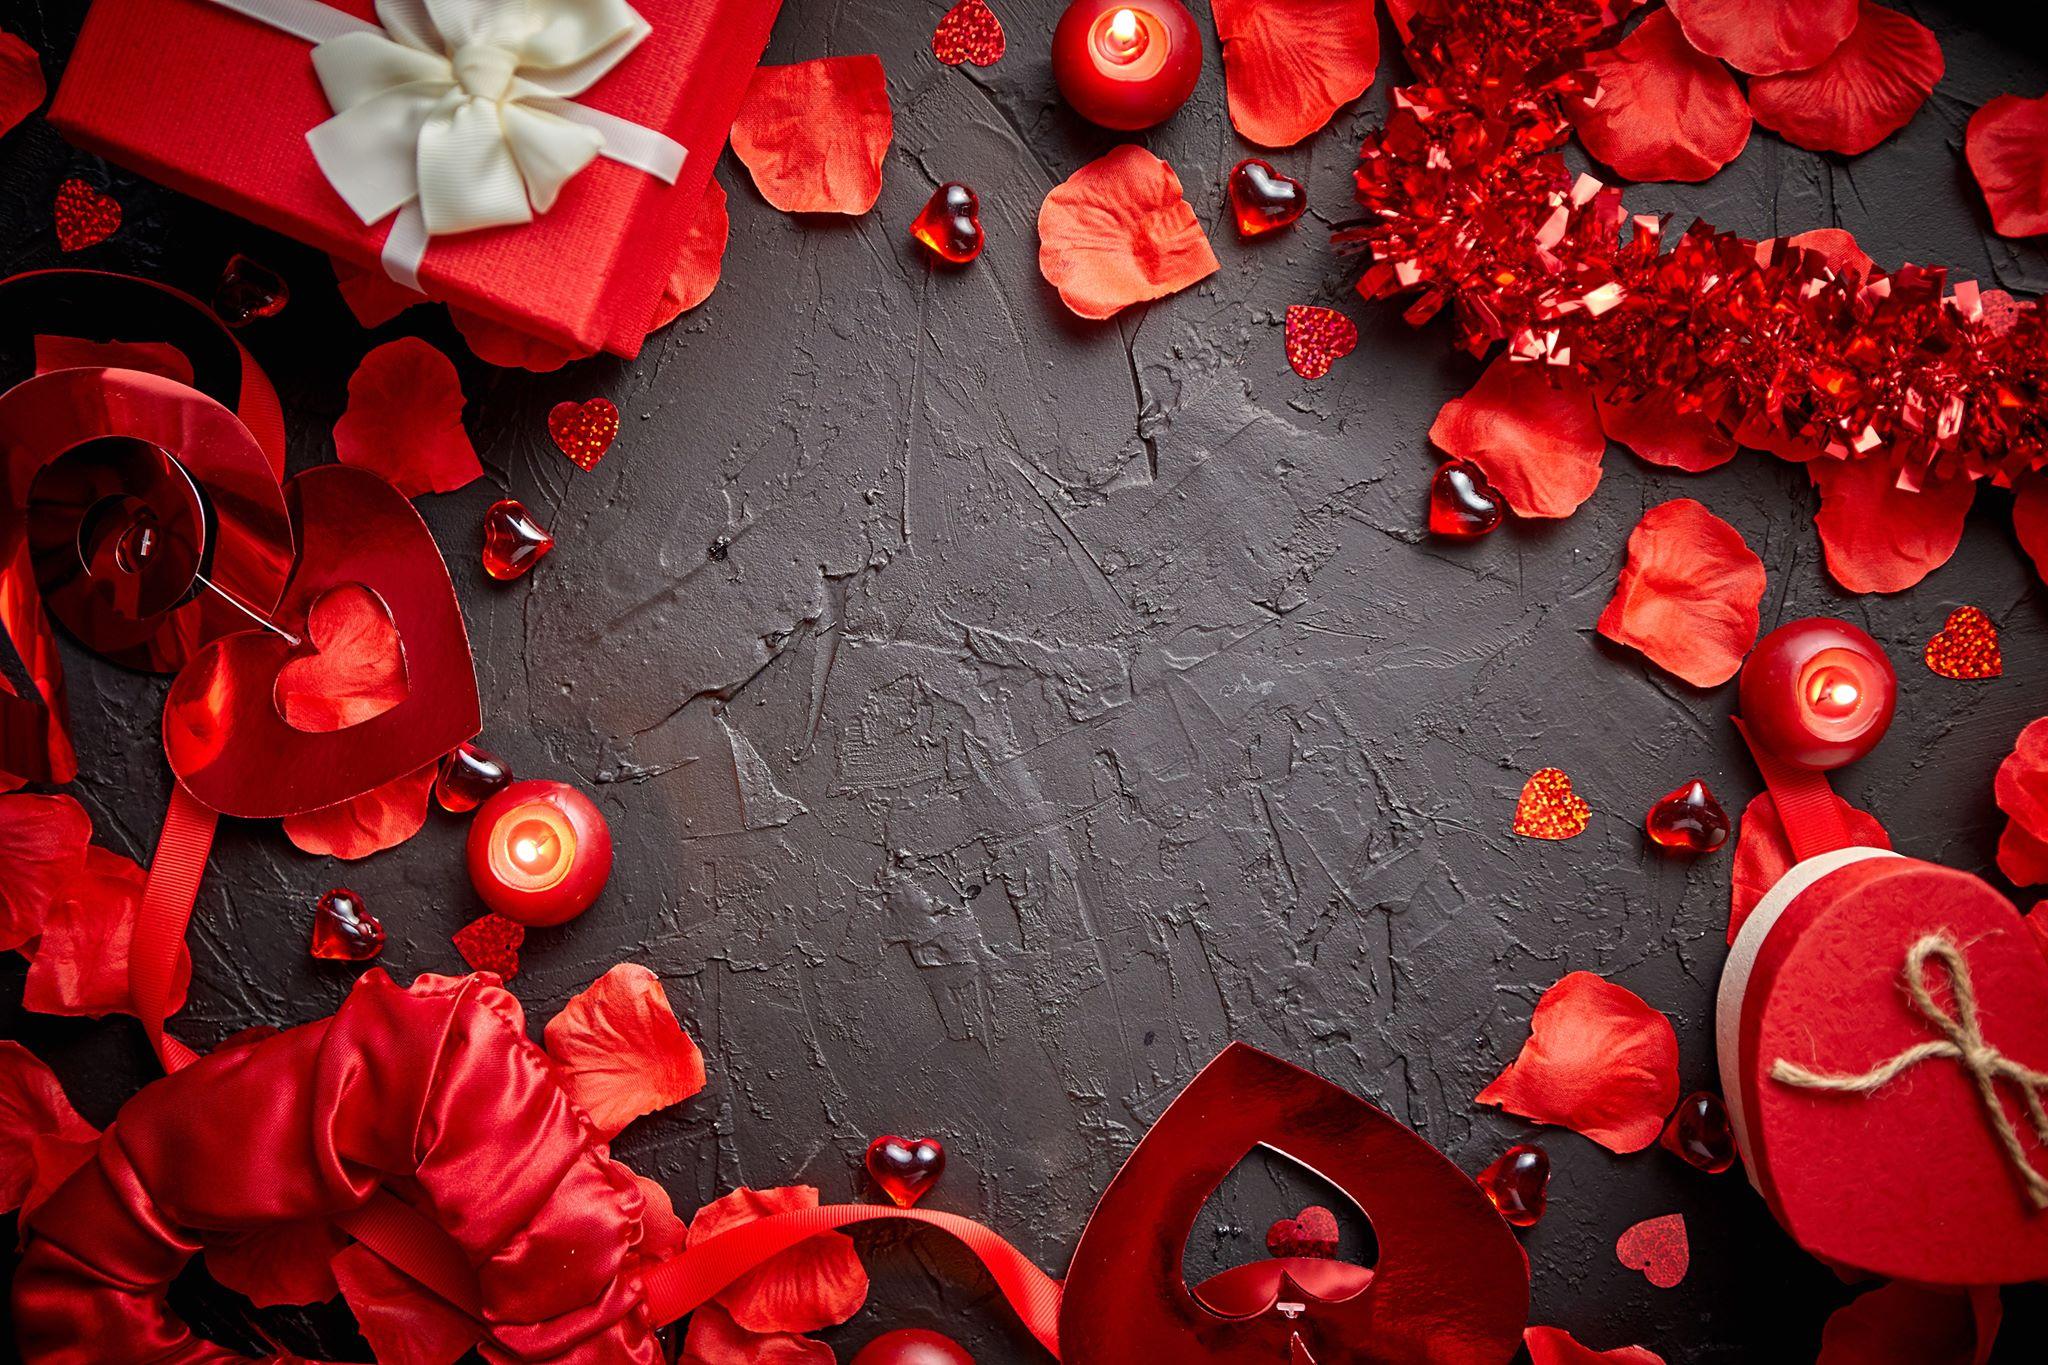 Valentines day images 2 صور عيد الحب